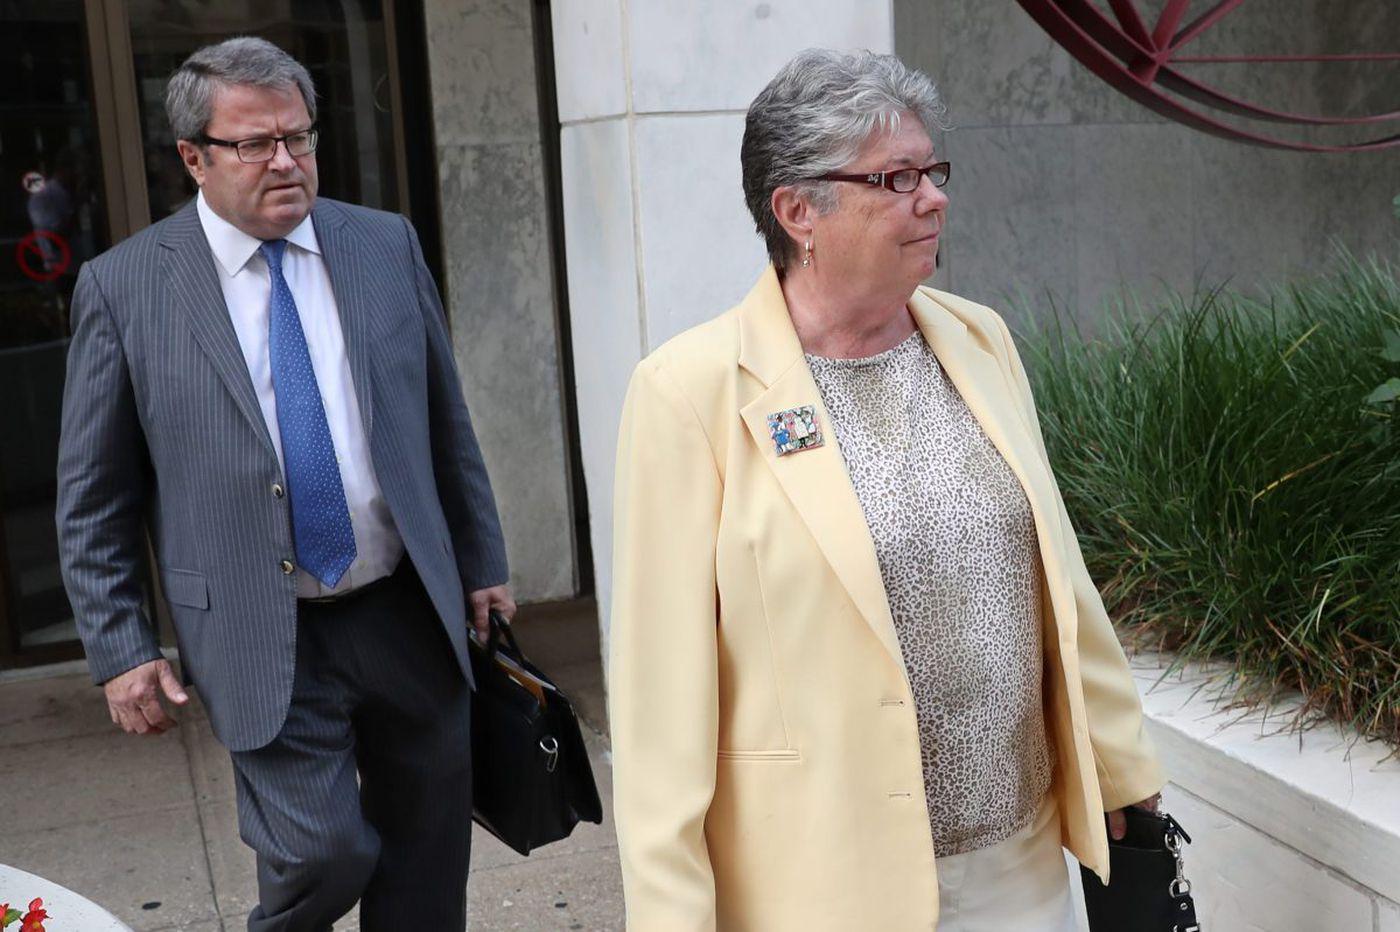 Ex-Pa. Treasurer Barbara Hafer sentenced to probation for lying